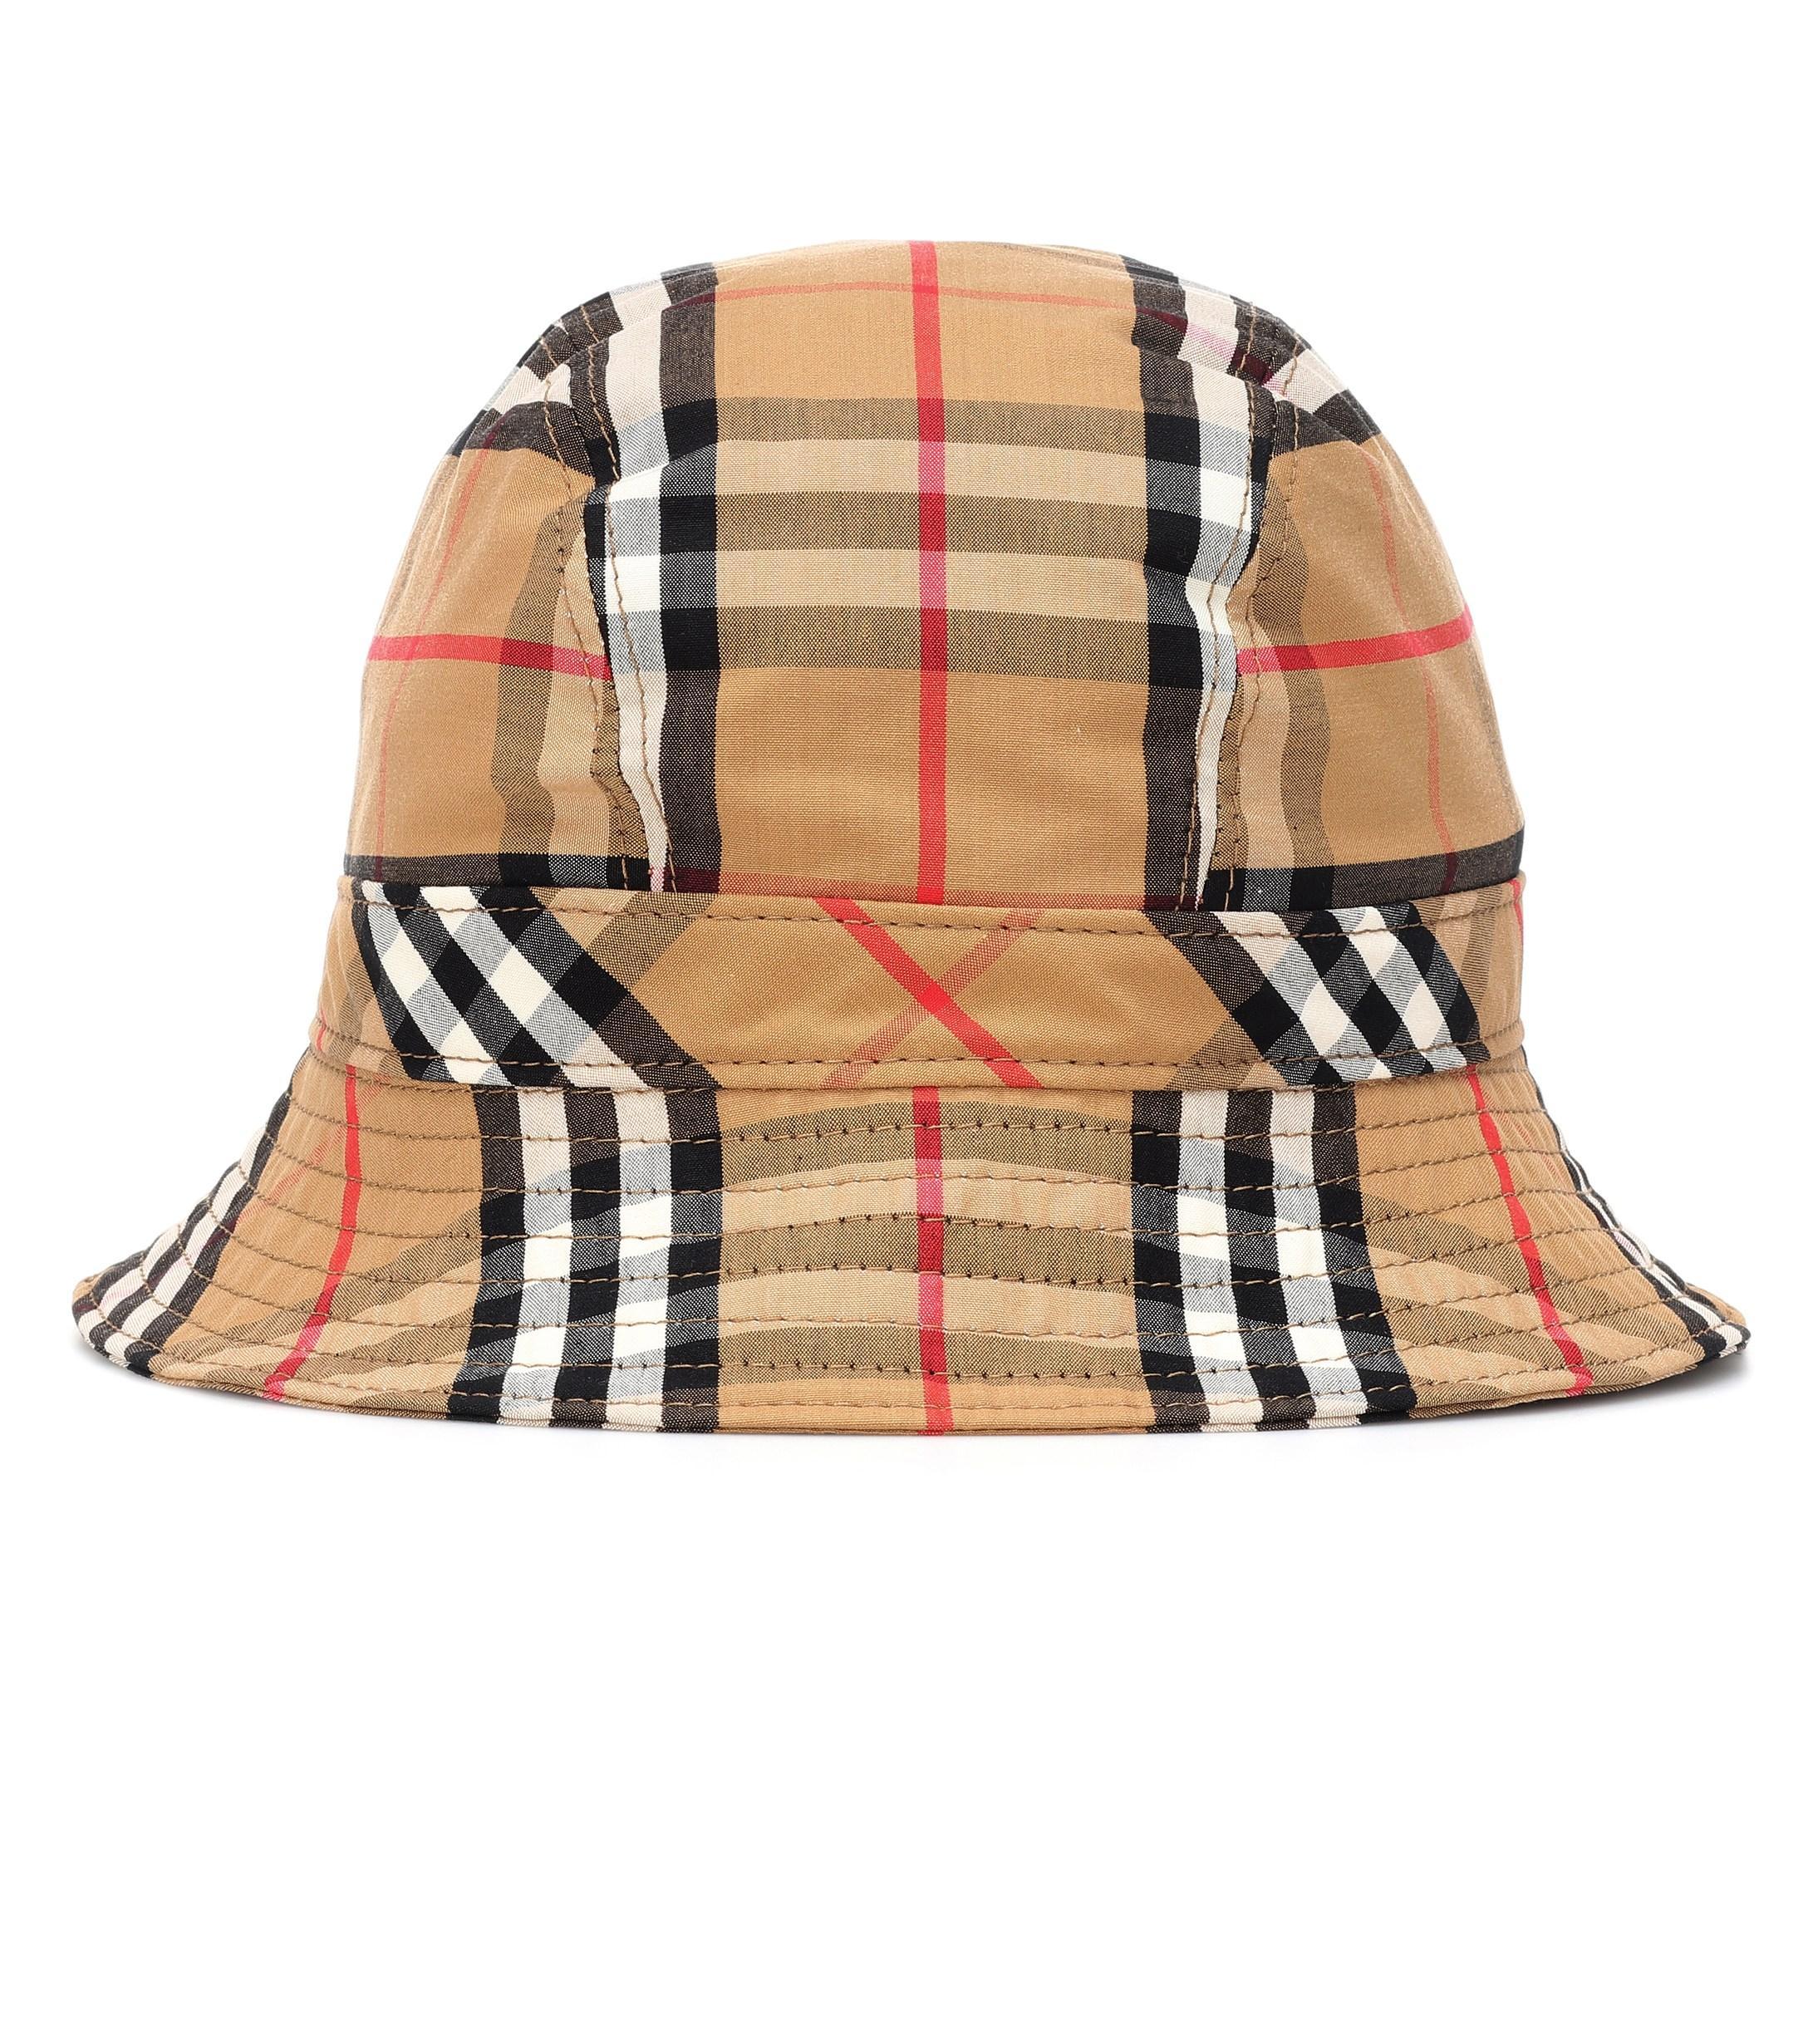 f9f96563603 Burberry. Women s Vintage Check Cotton Bucket Hat